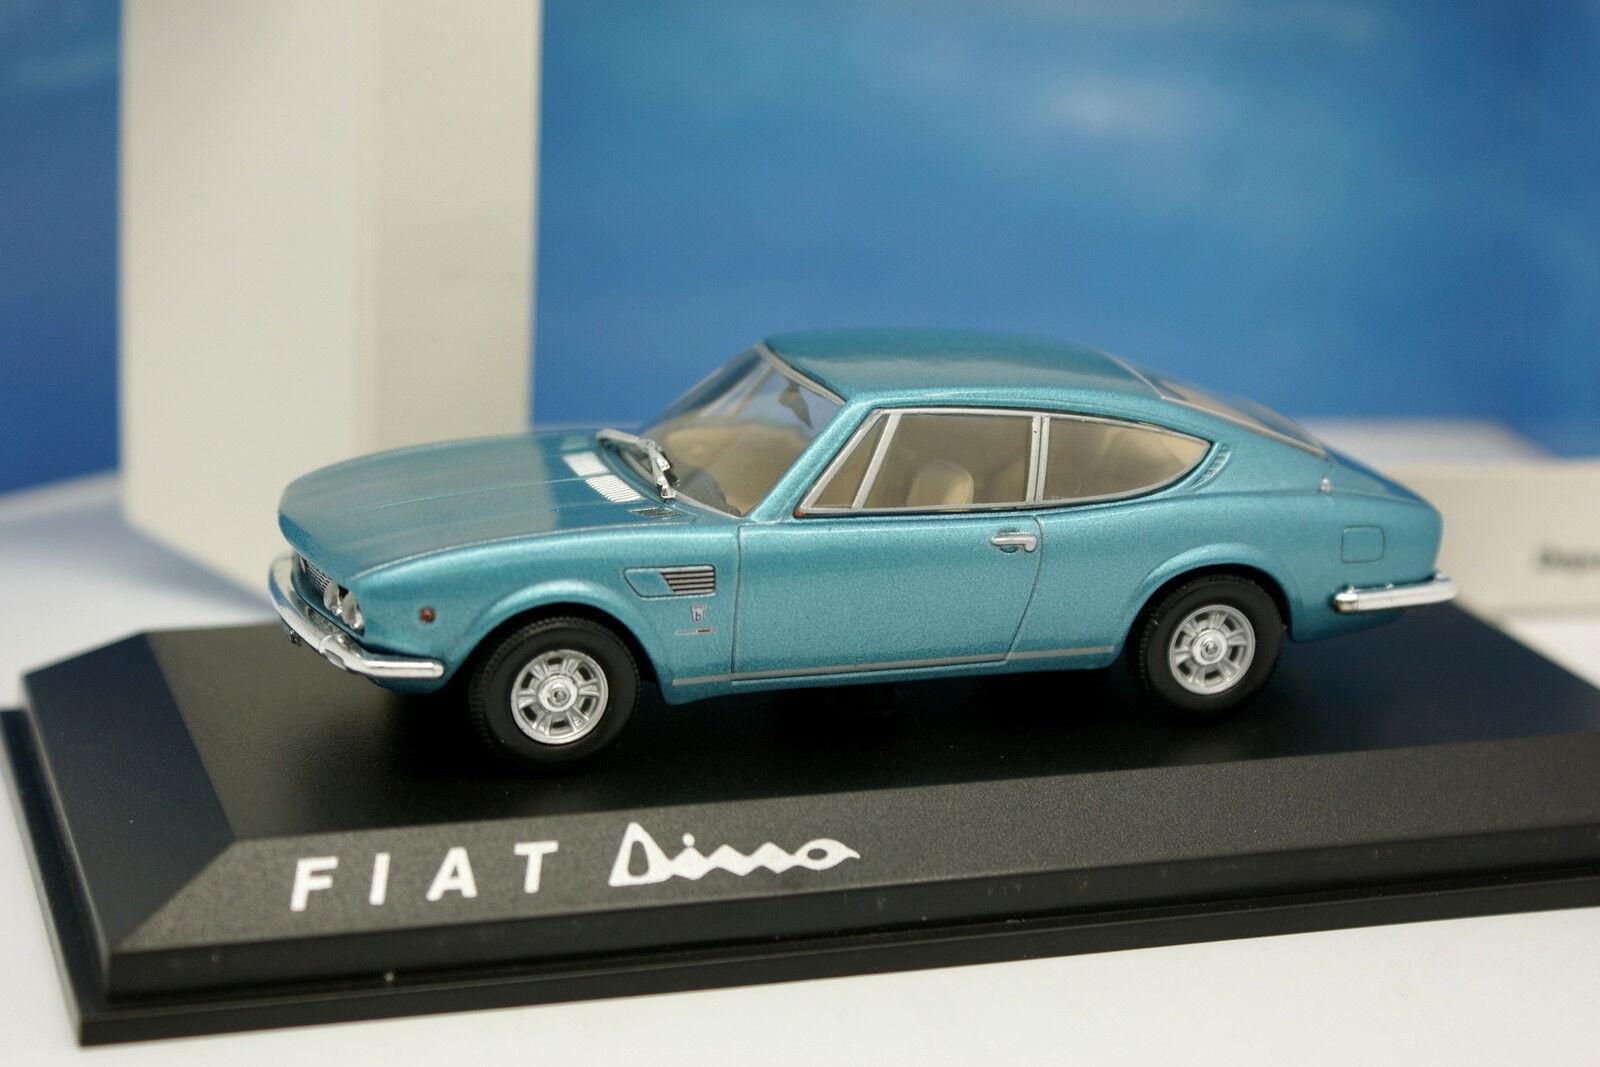 Norev 1 43 - Fiat Dino bluee 1968